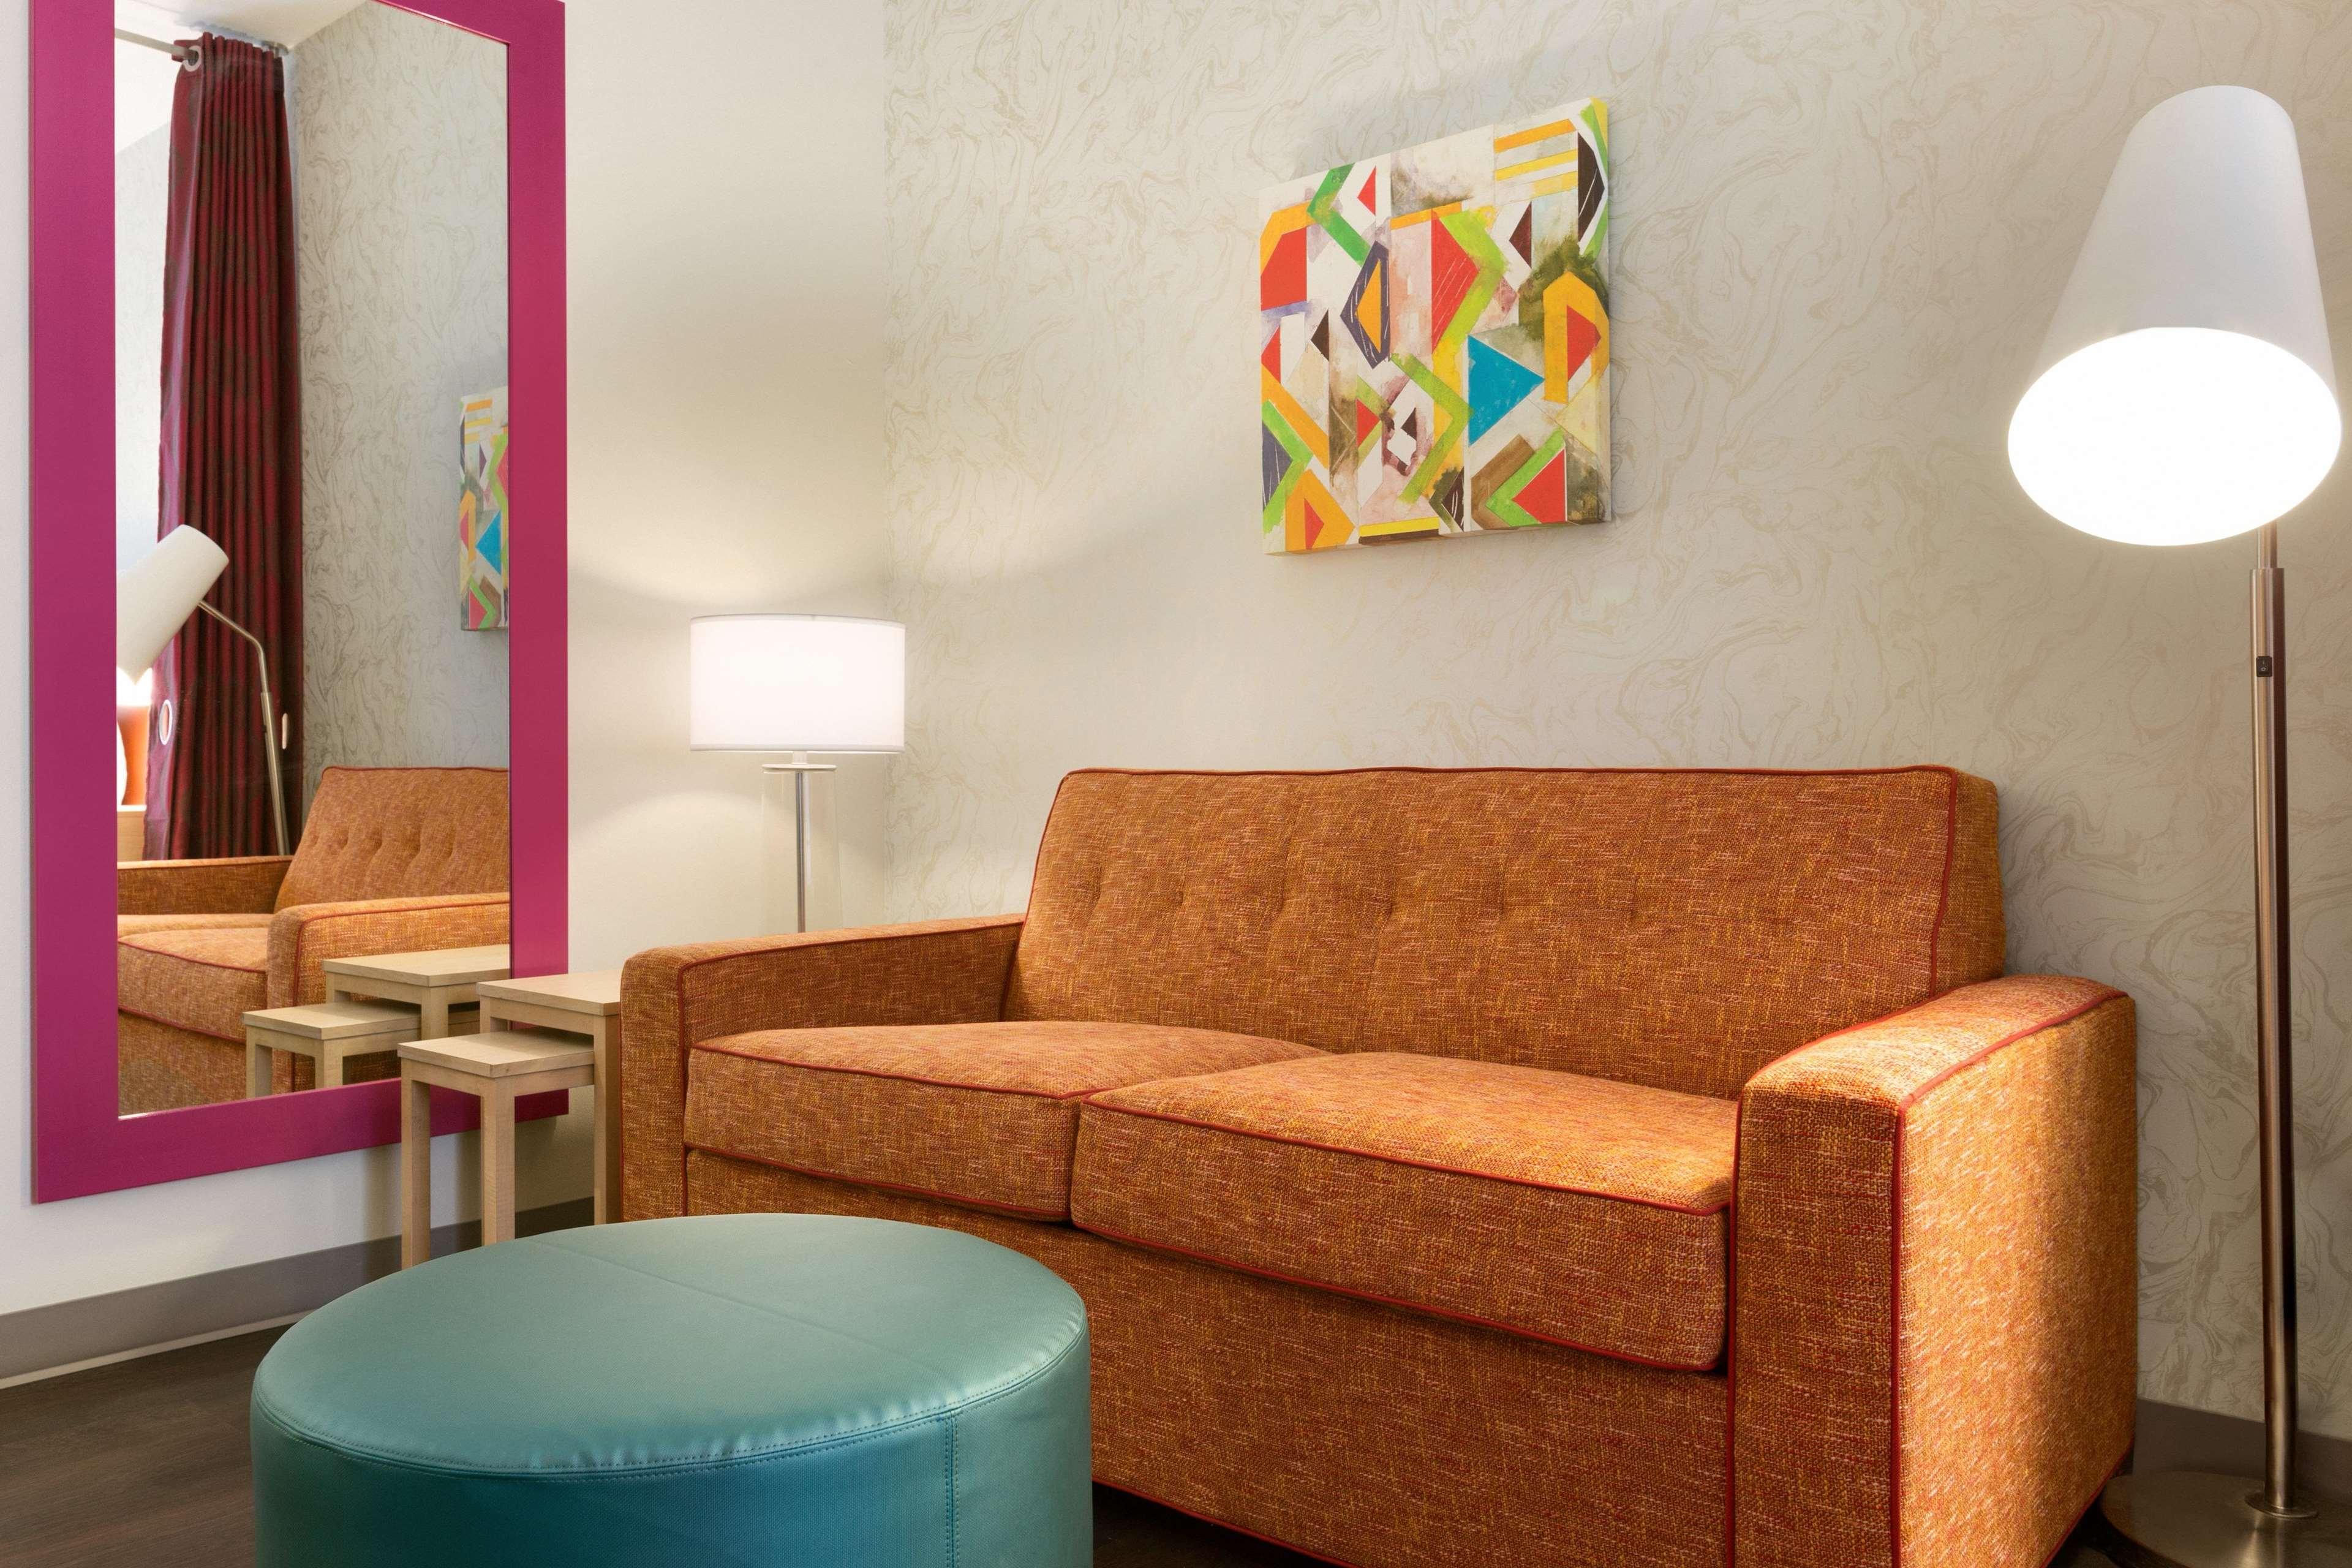 Home2 Suites by Hilton Florence Cincinnati Airport South image 26